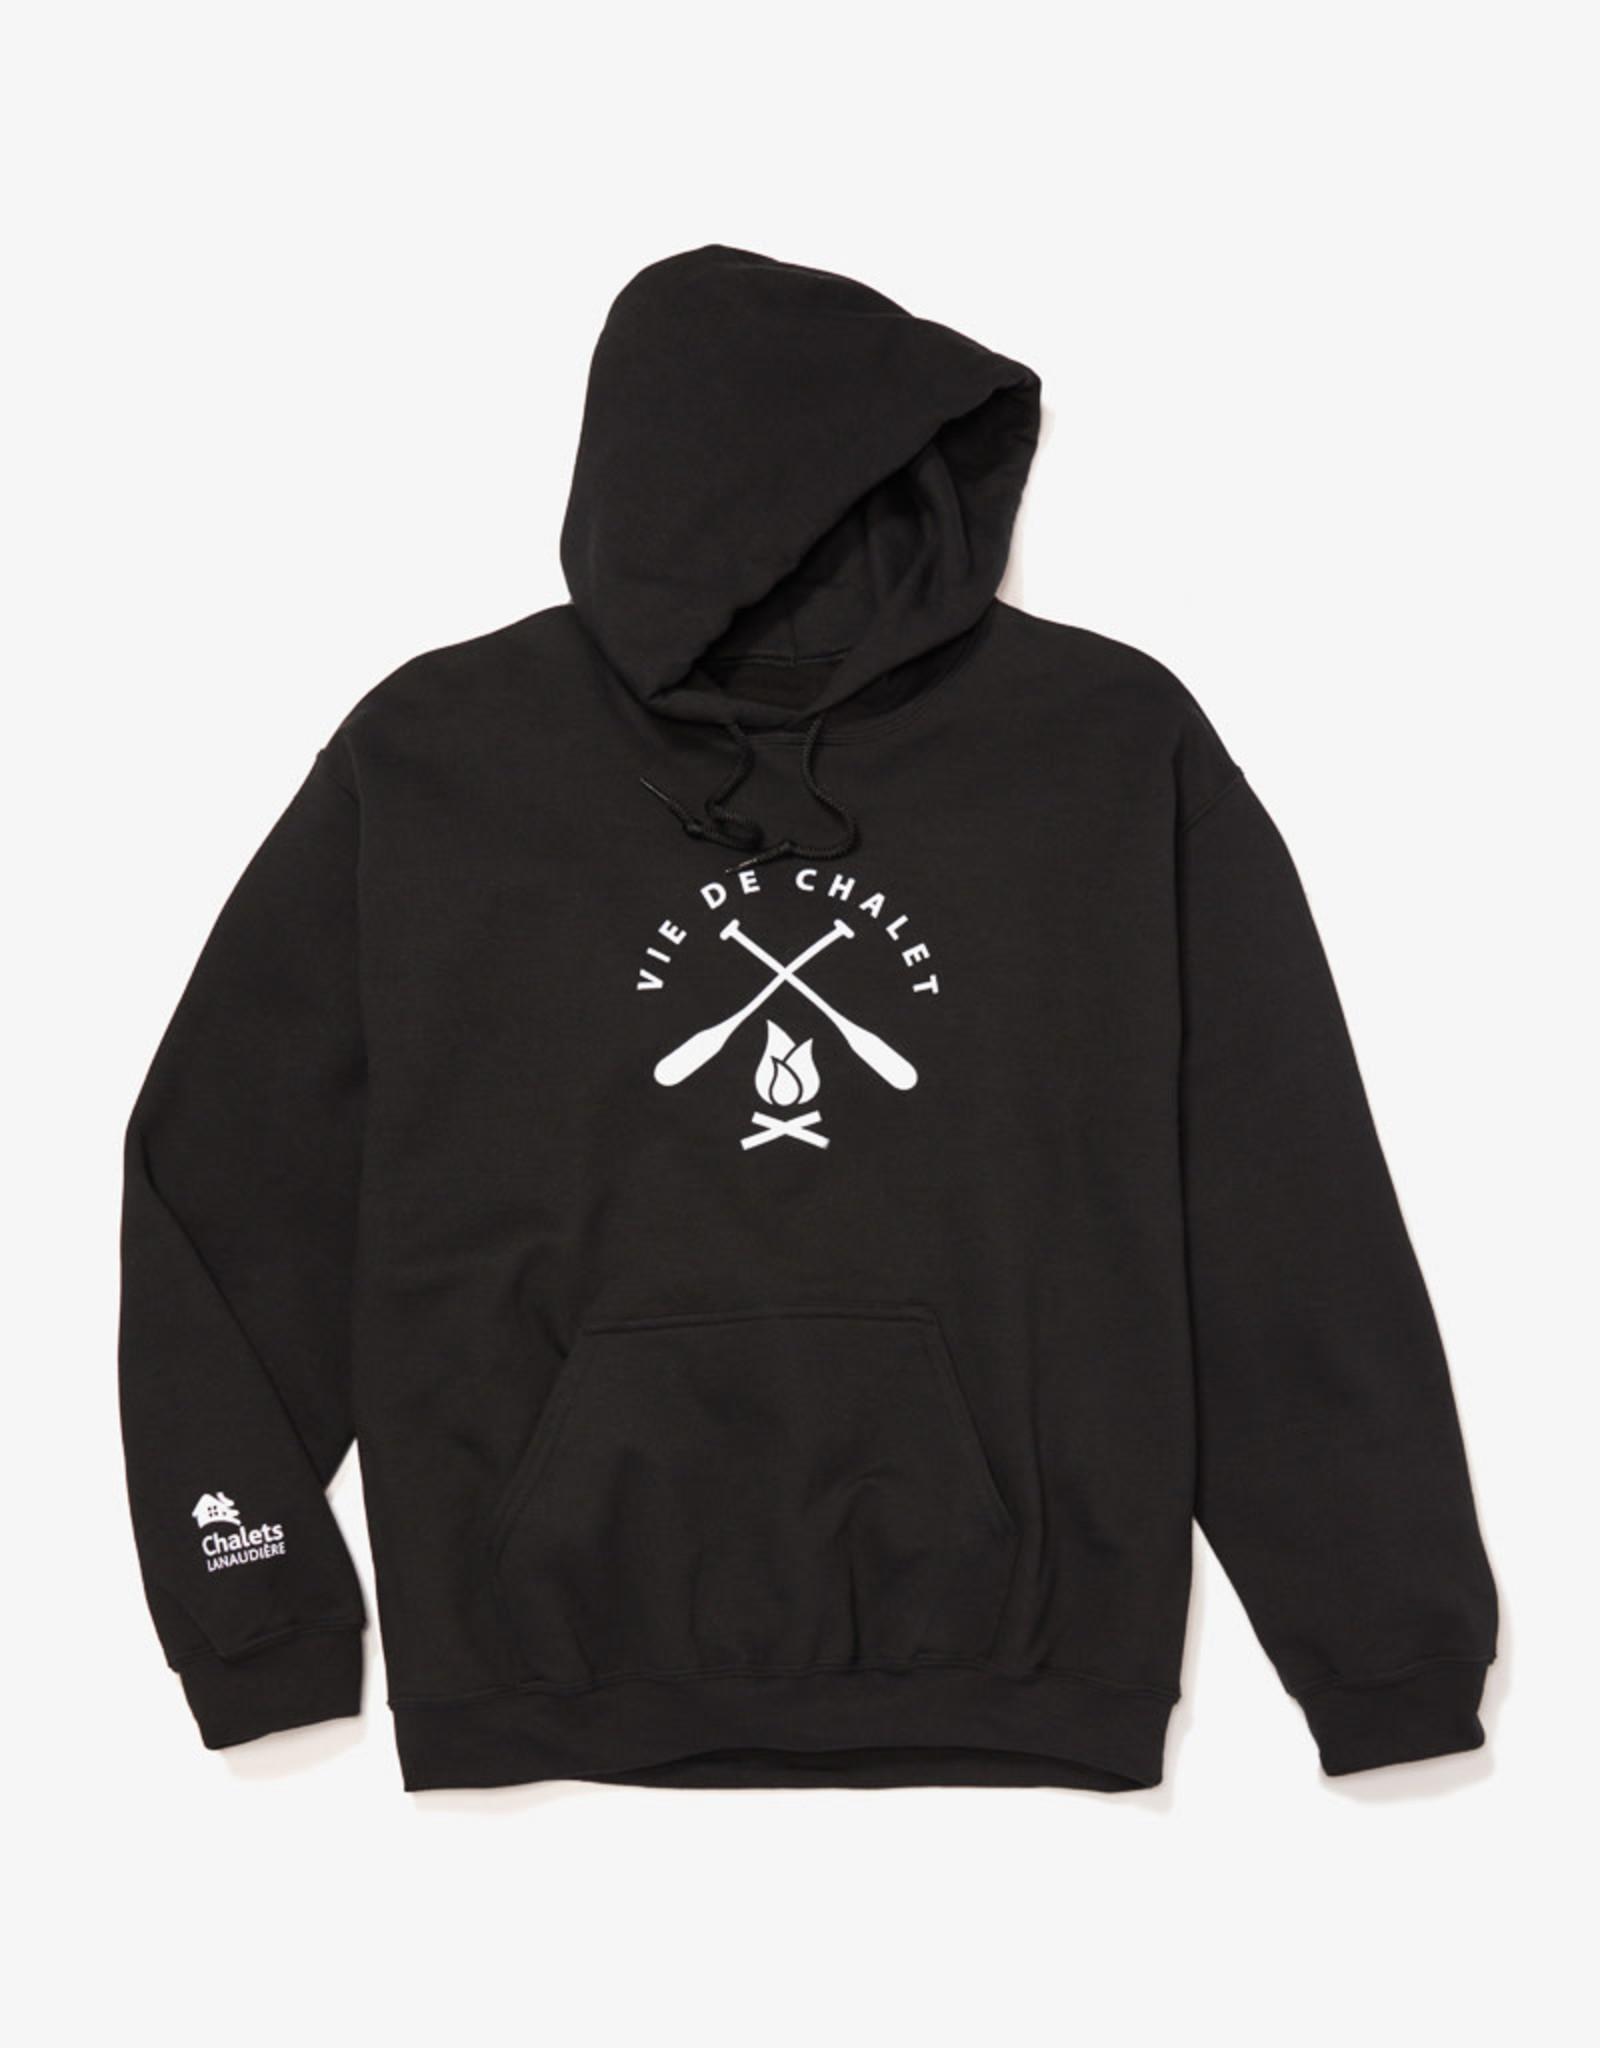 GILDAN Black kangaroo printed sweatshirt for adults